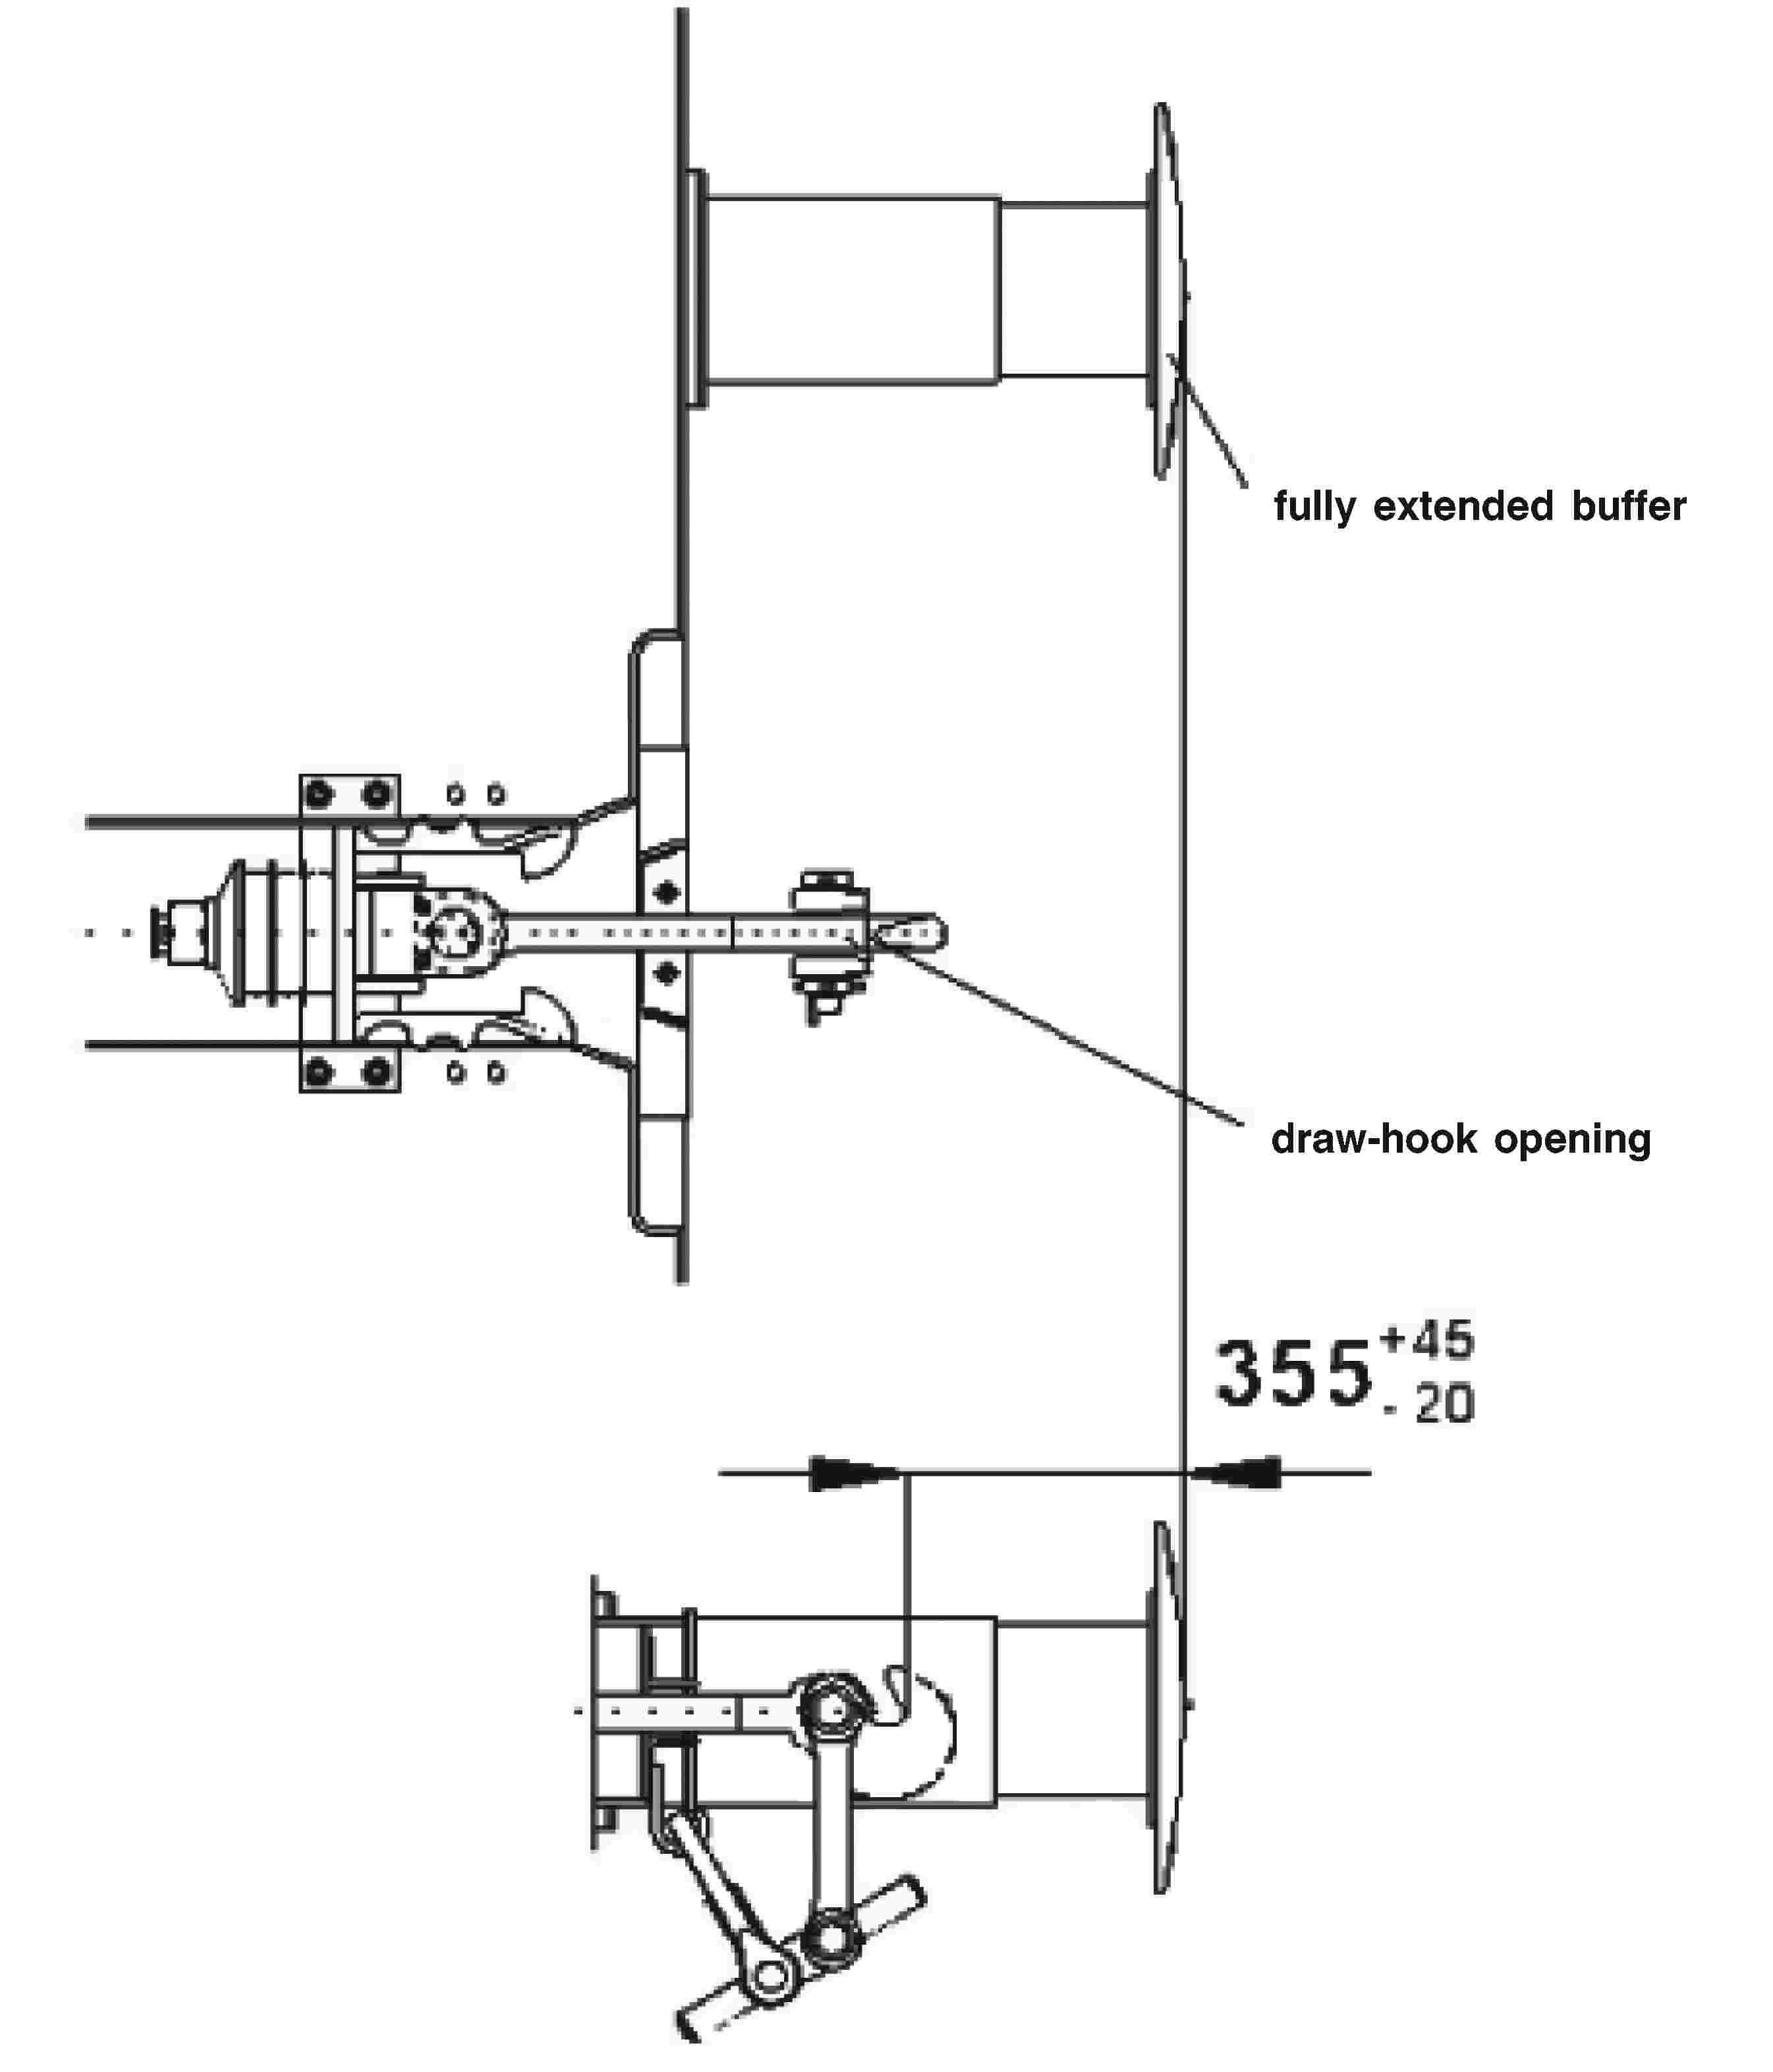 Eur Lex 02013r0321 20150701 Ga Door Knob Touch Alarm Circuit Controlcircuit Diagram Figure C1 Configuration Of Buffers And Draw Gear Image